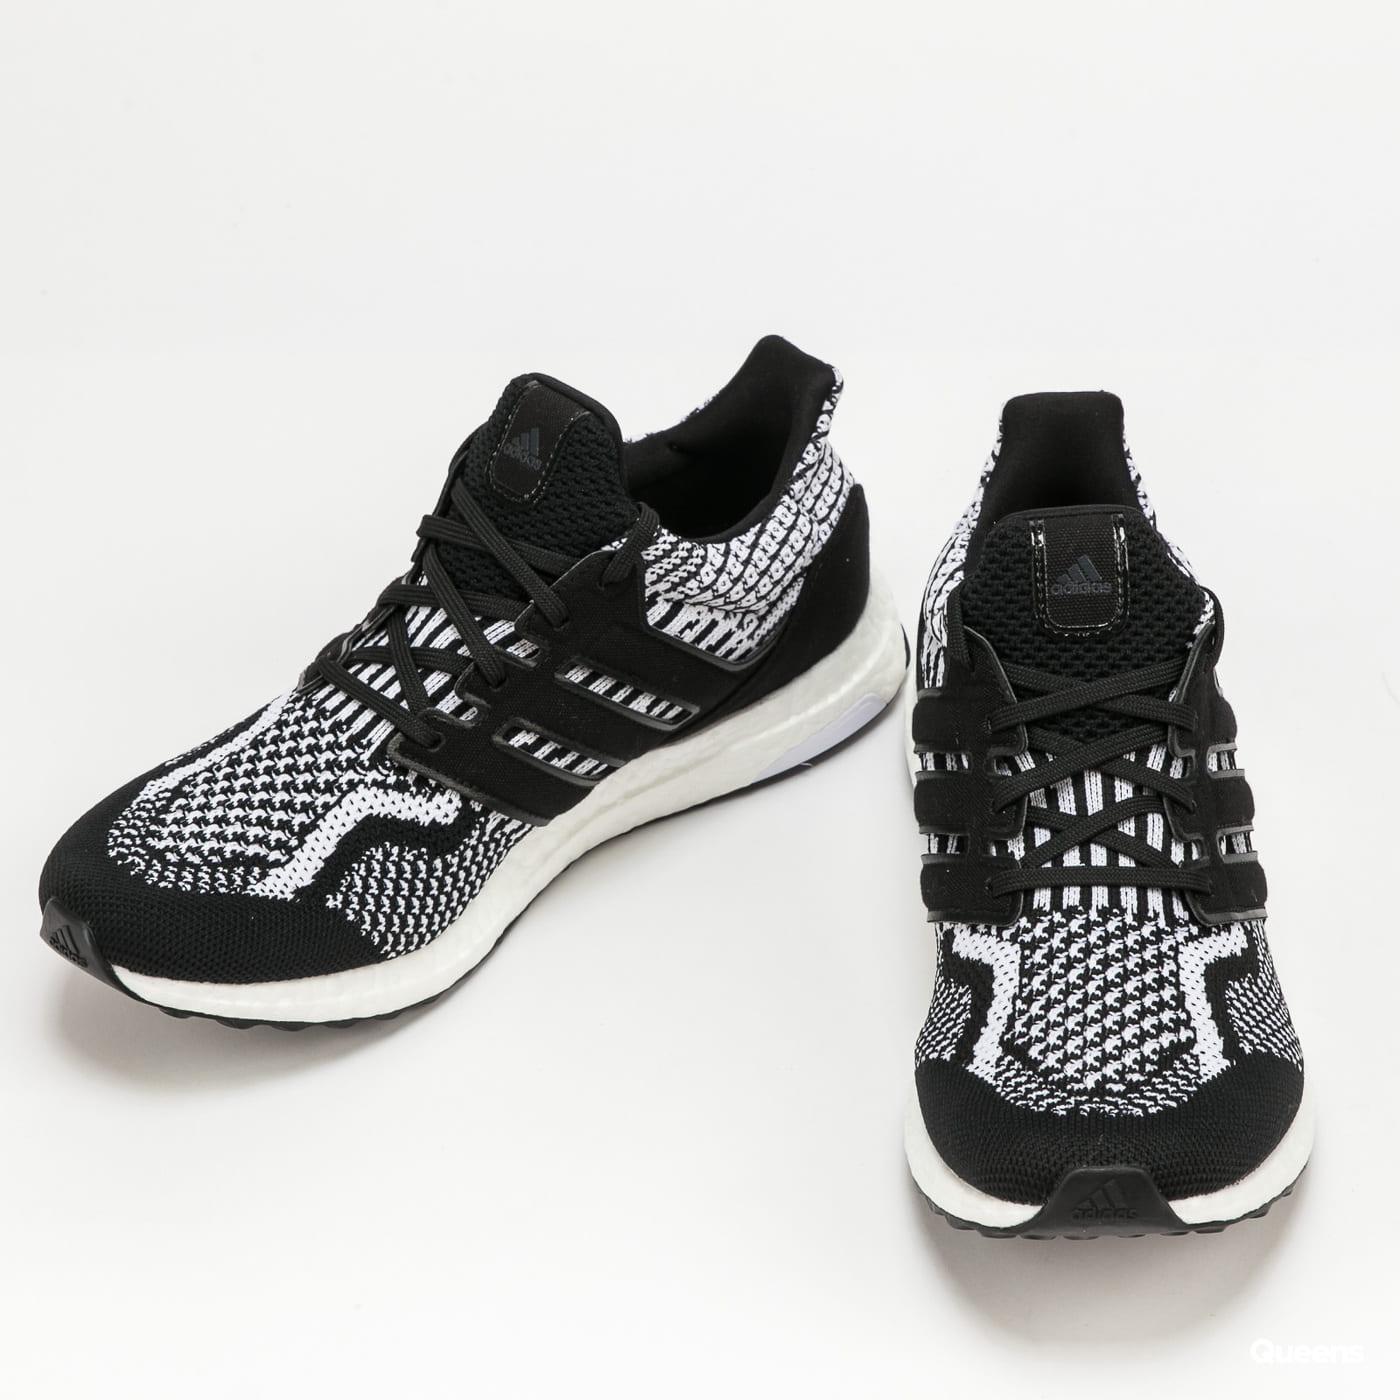 adidas Performance Ultraboost 5.0 DNA